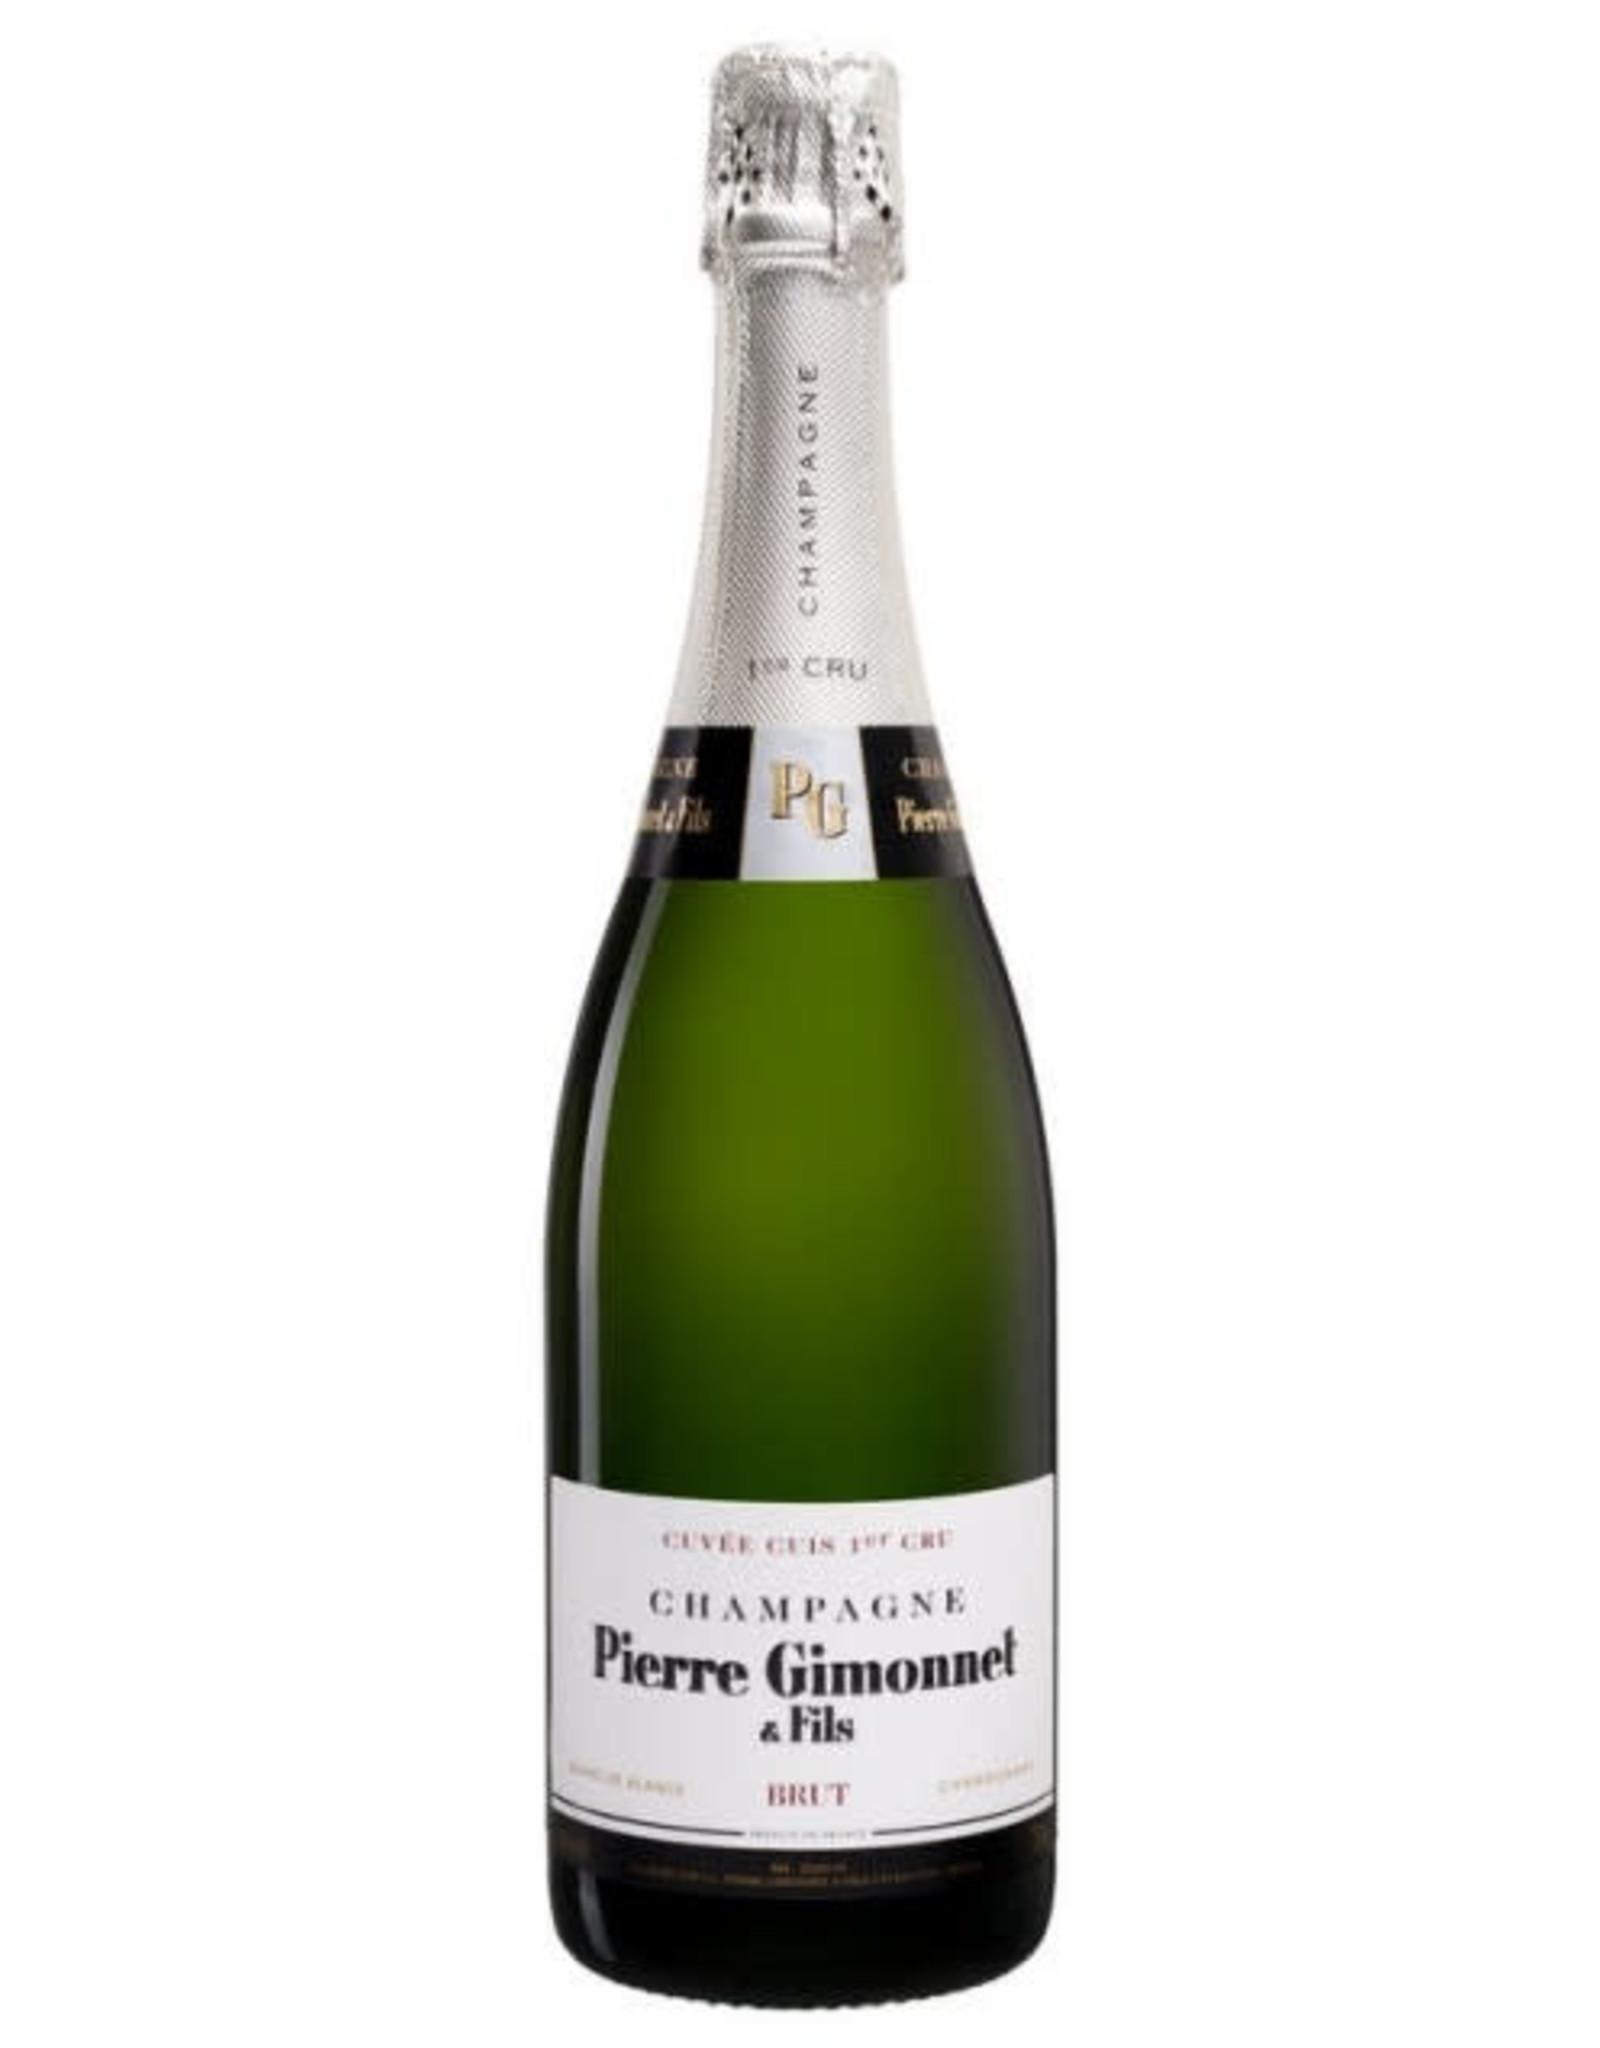 Pierre Gimonnet & Fils Champagne